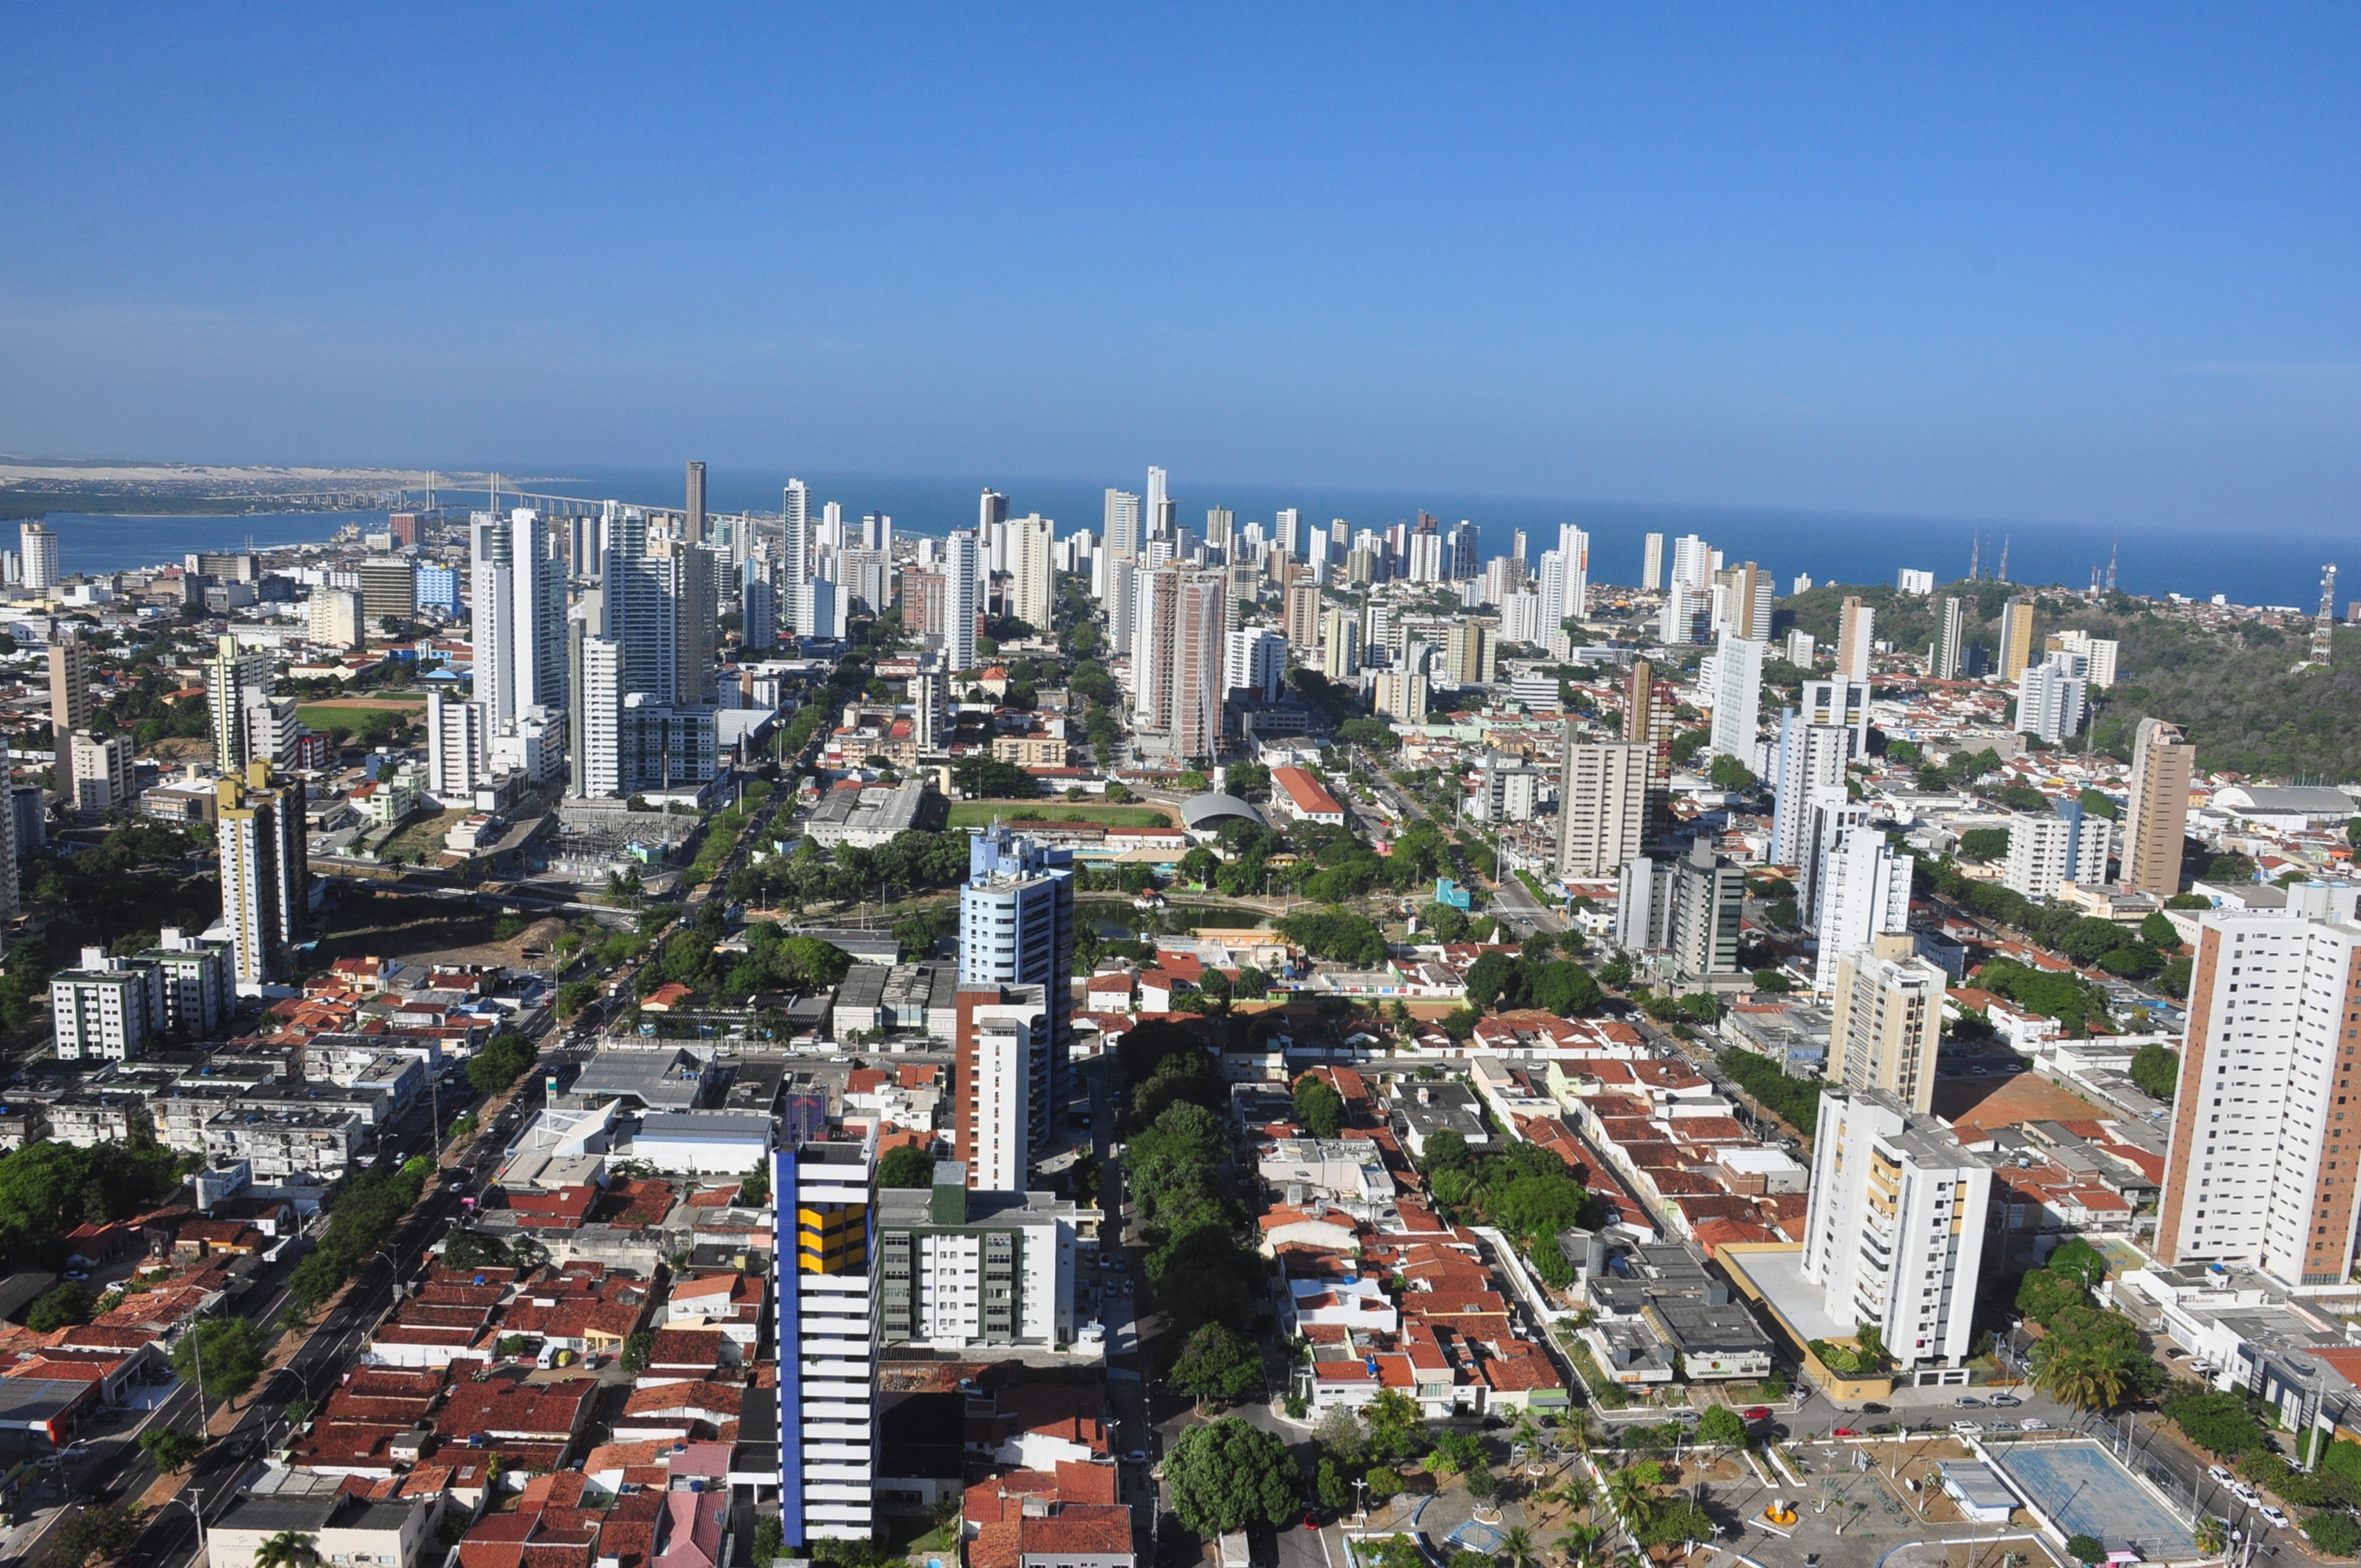 Fotos Aéreas Cidade de Natal 69 Avenida Prudente de Morais 1